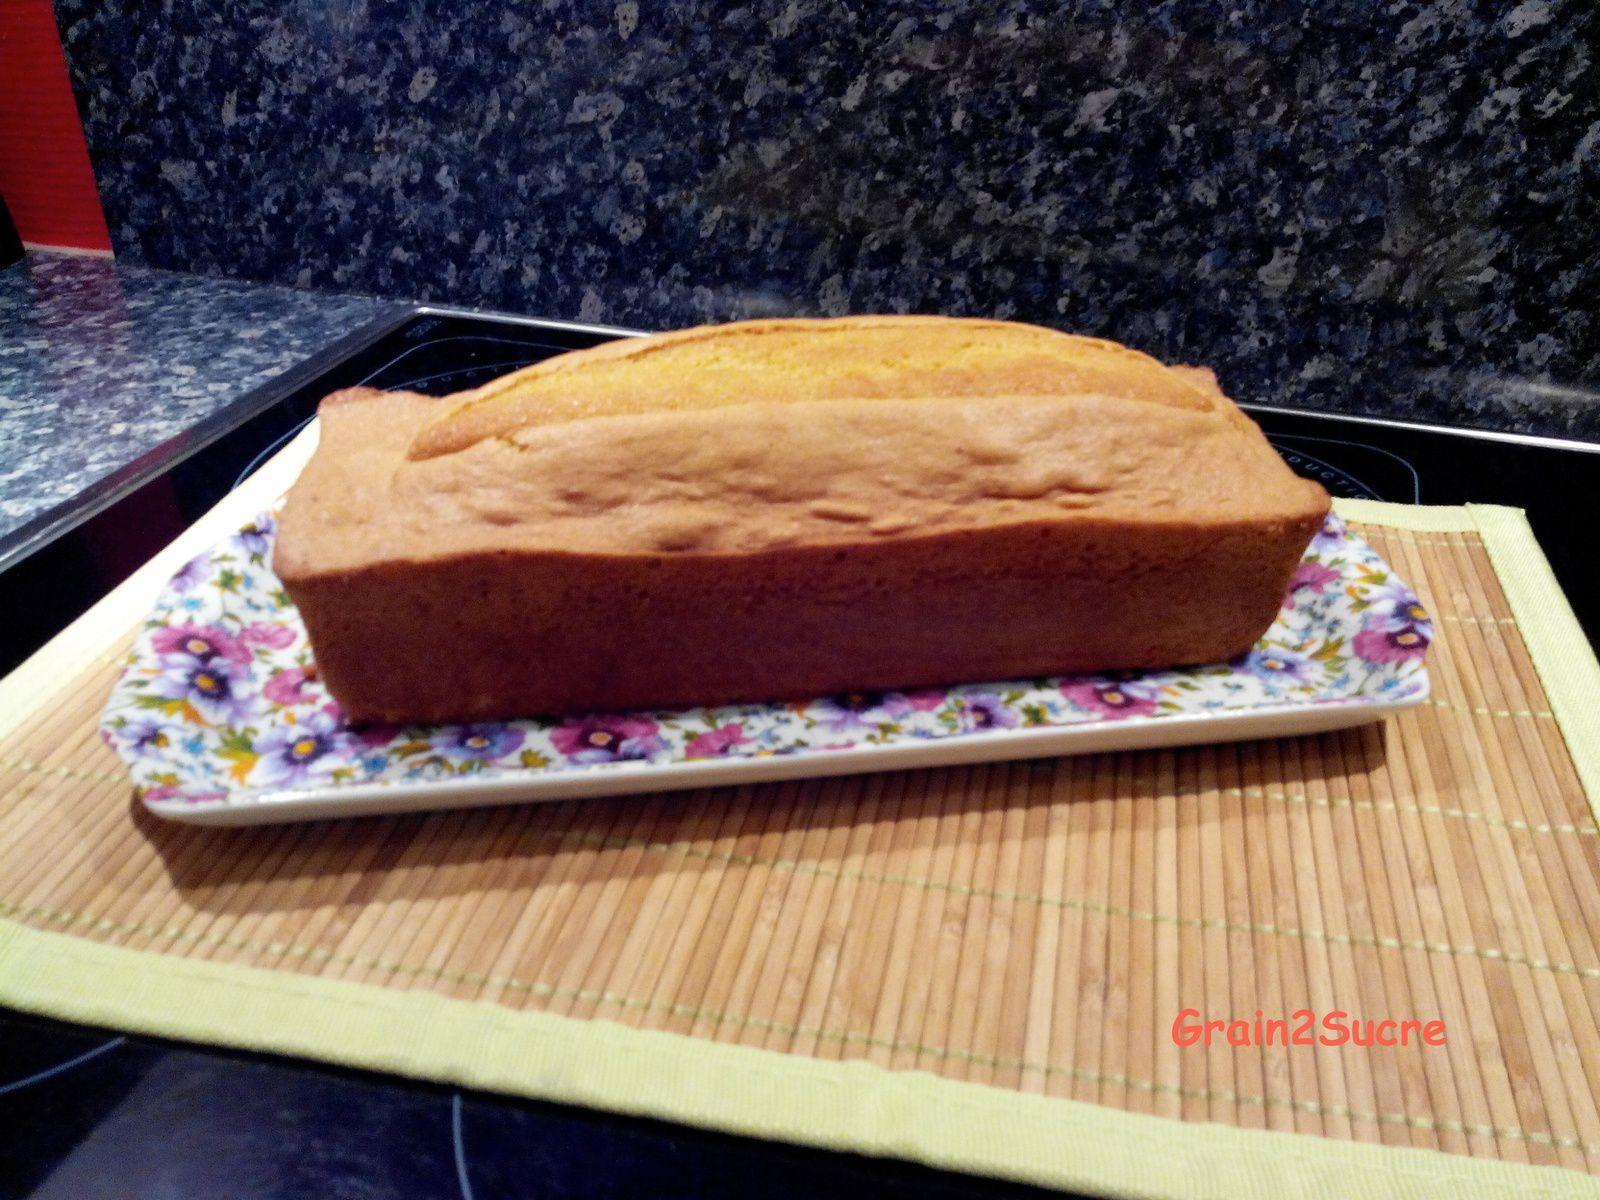 Grain2Sucre. Recette Cake, farine,œufs, beurre, sucre, levure.